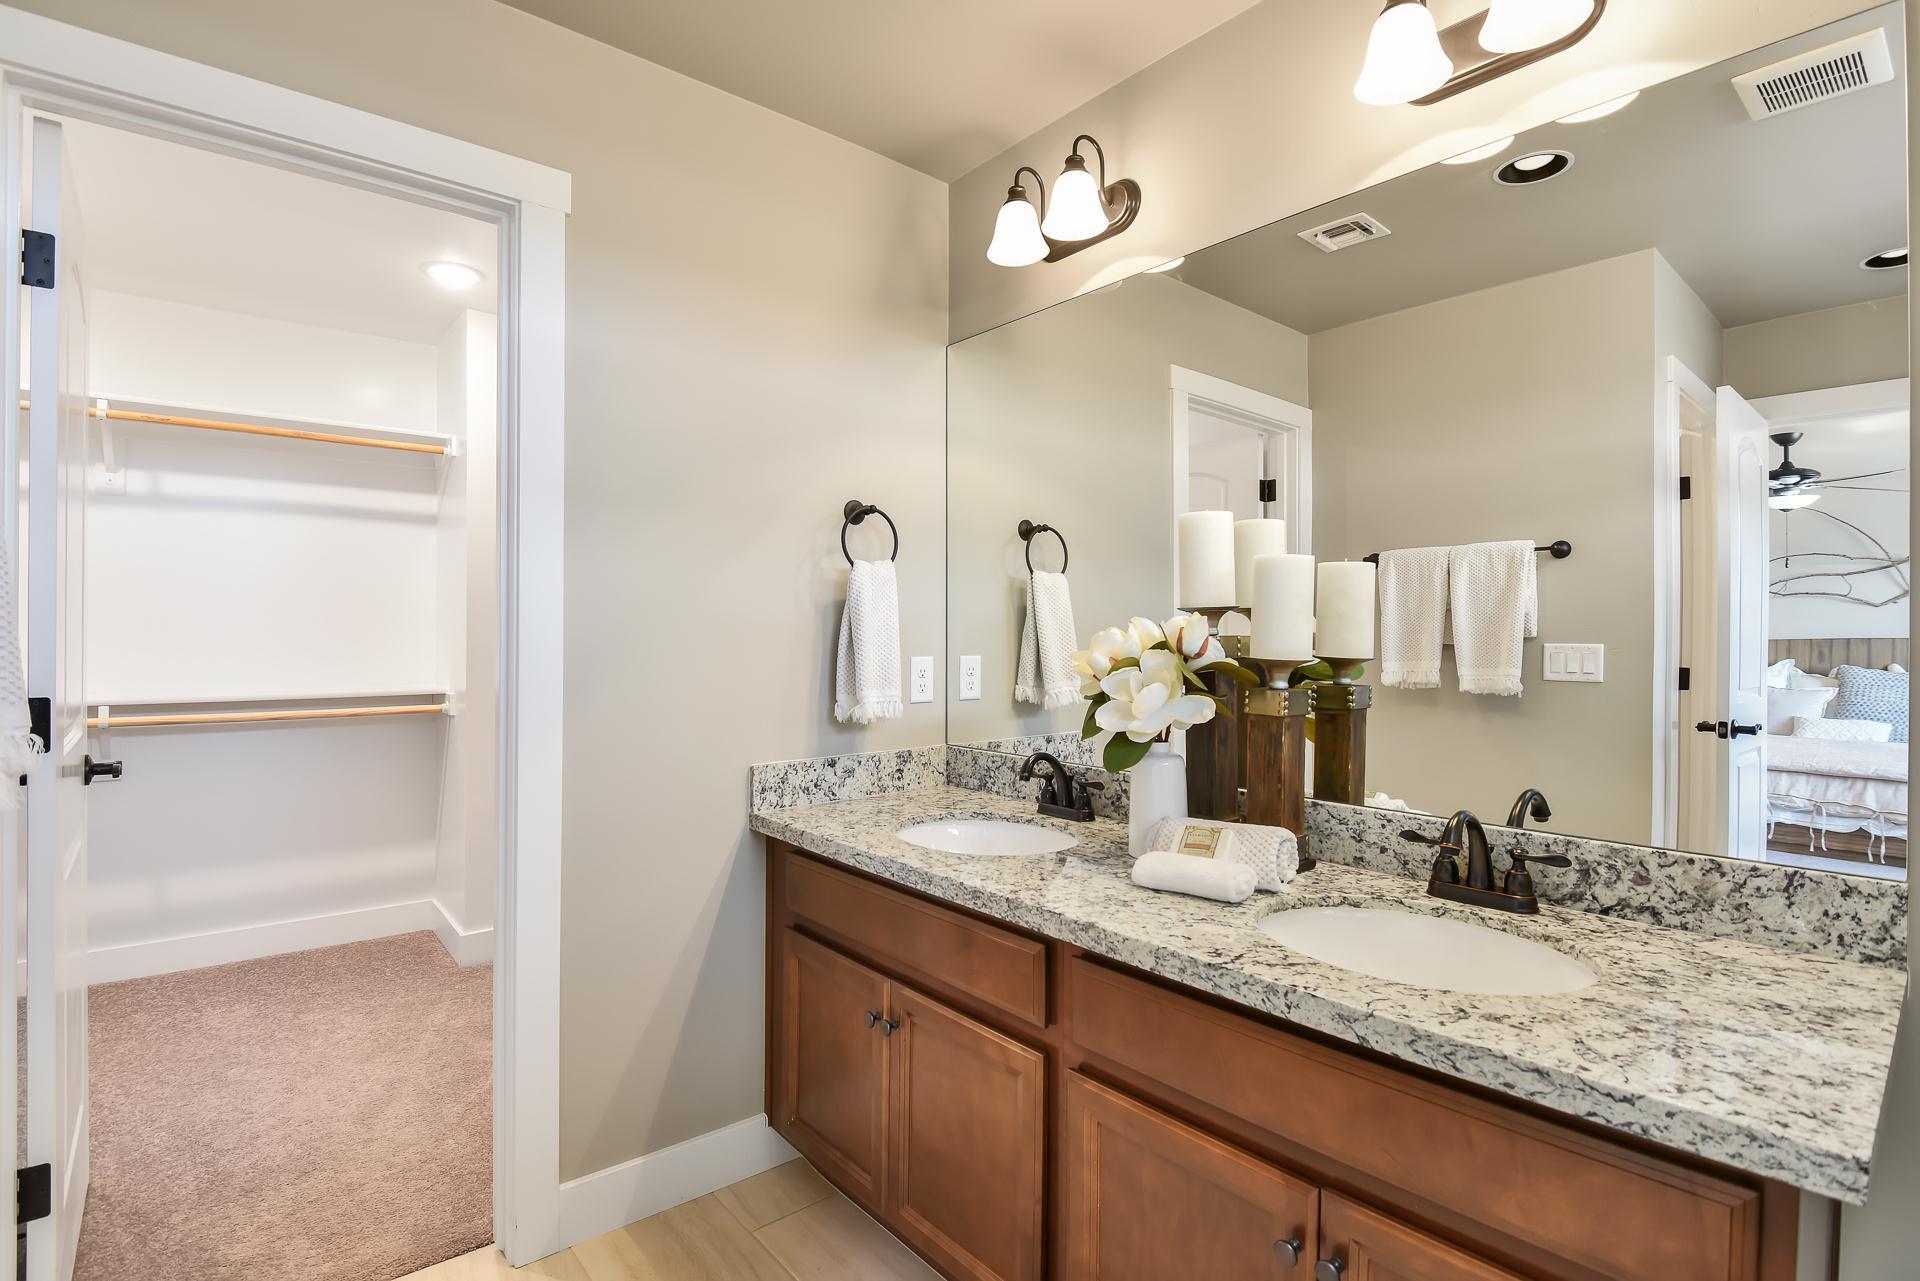 Bathroom featured in the Flagstaff Meadows Plan 1941 By Capstone Homes in Flagstaff, AZ